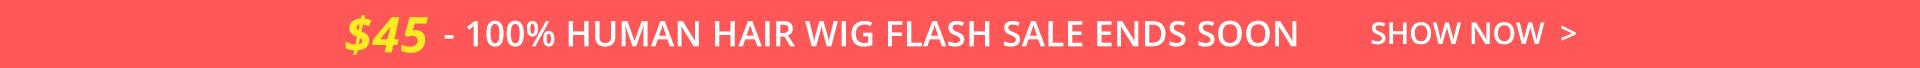 $19 BOB WIG FLASH SALE ENDS SOON